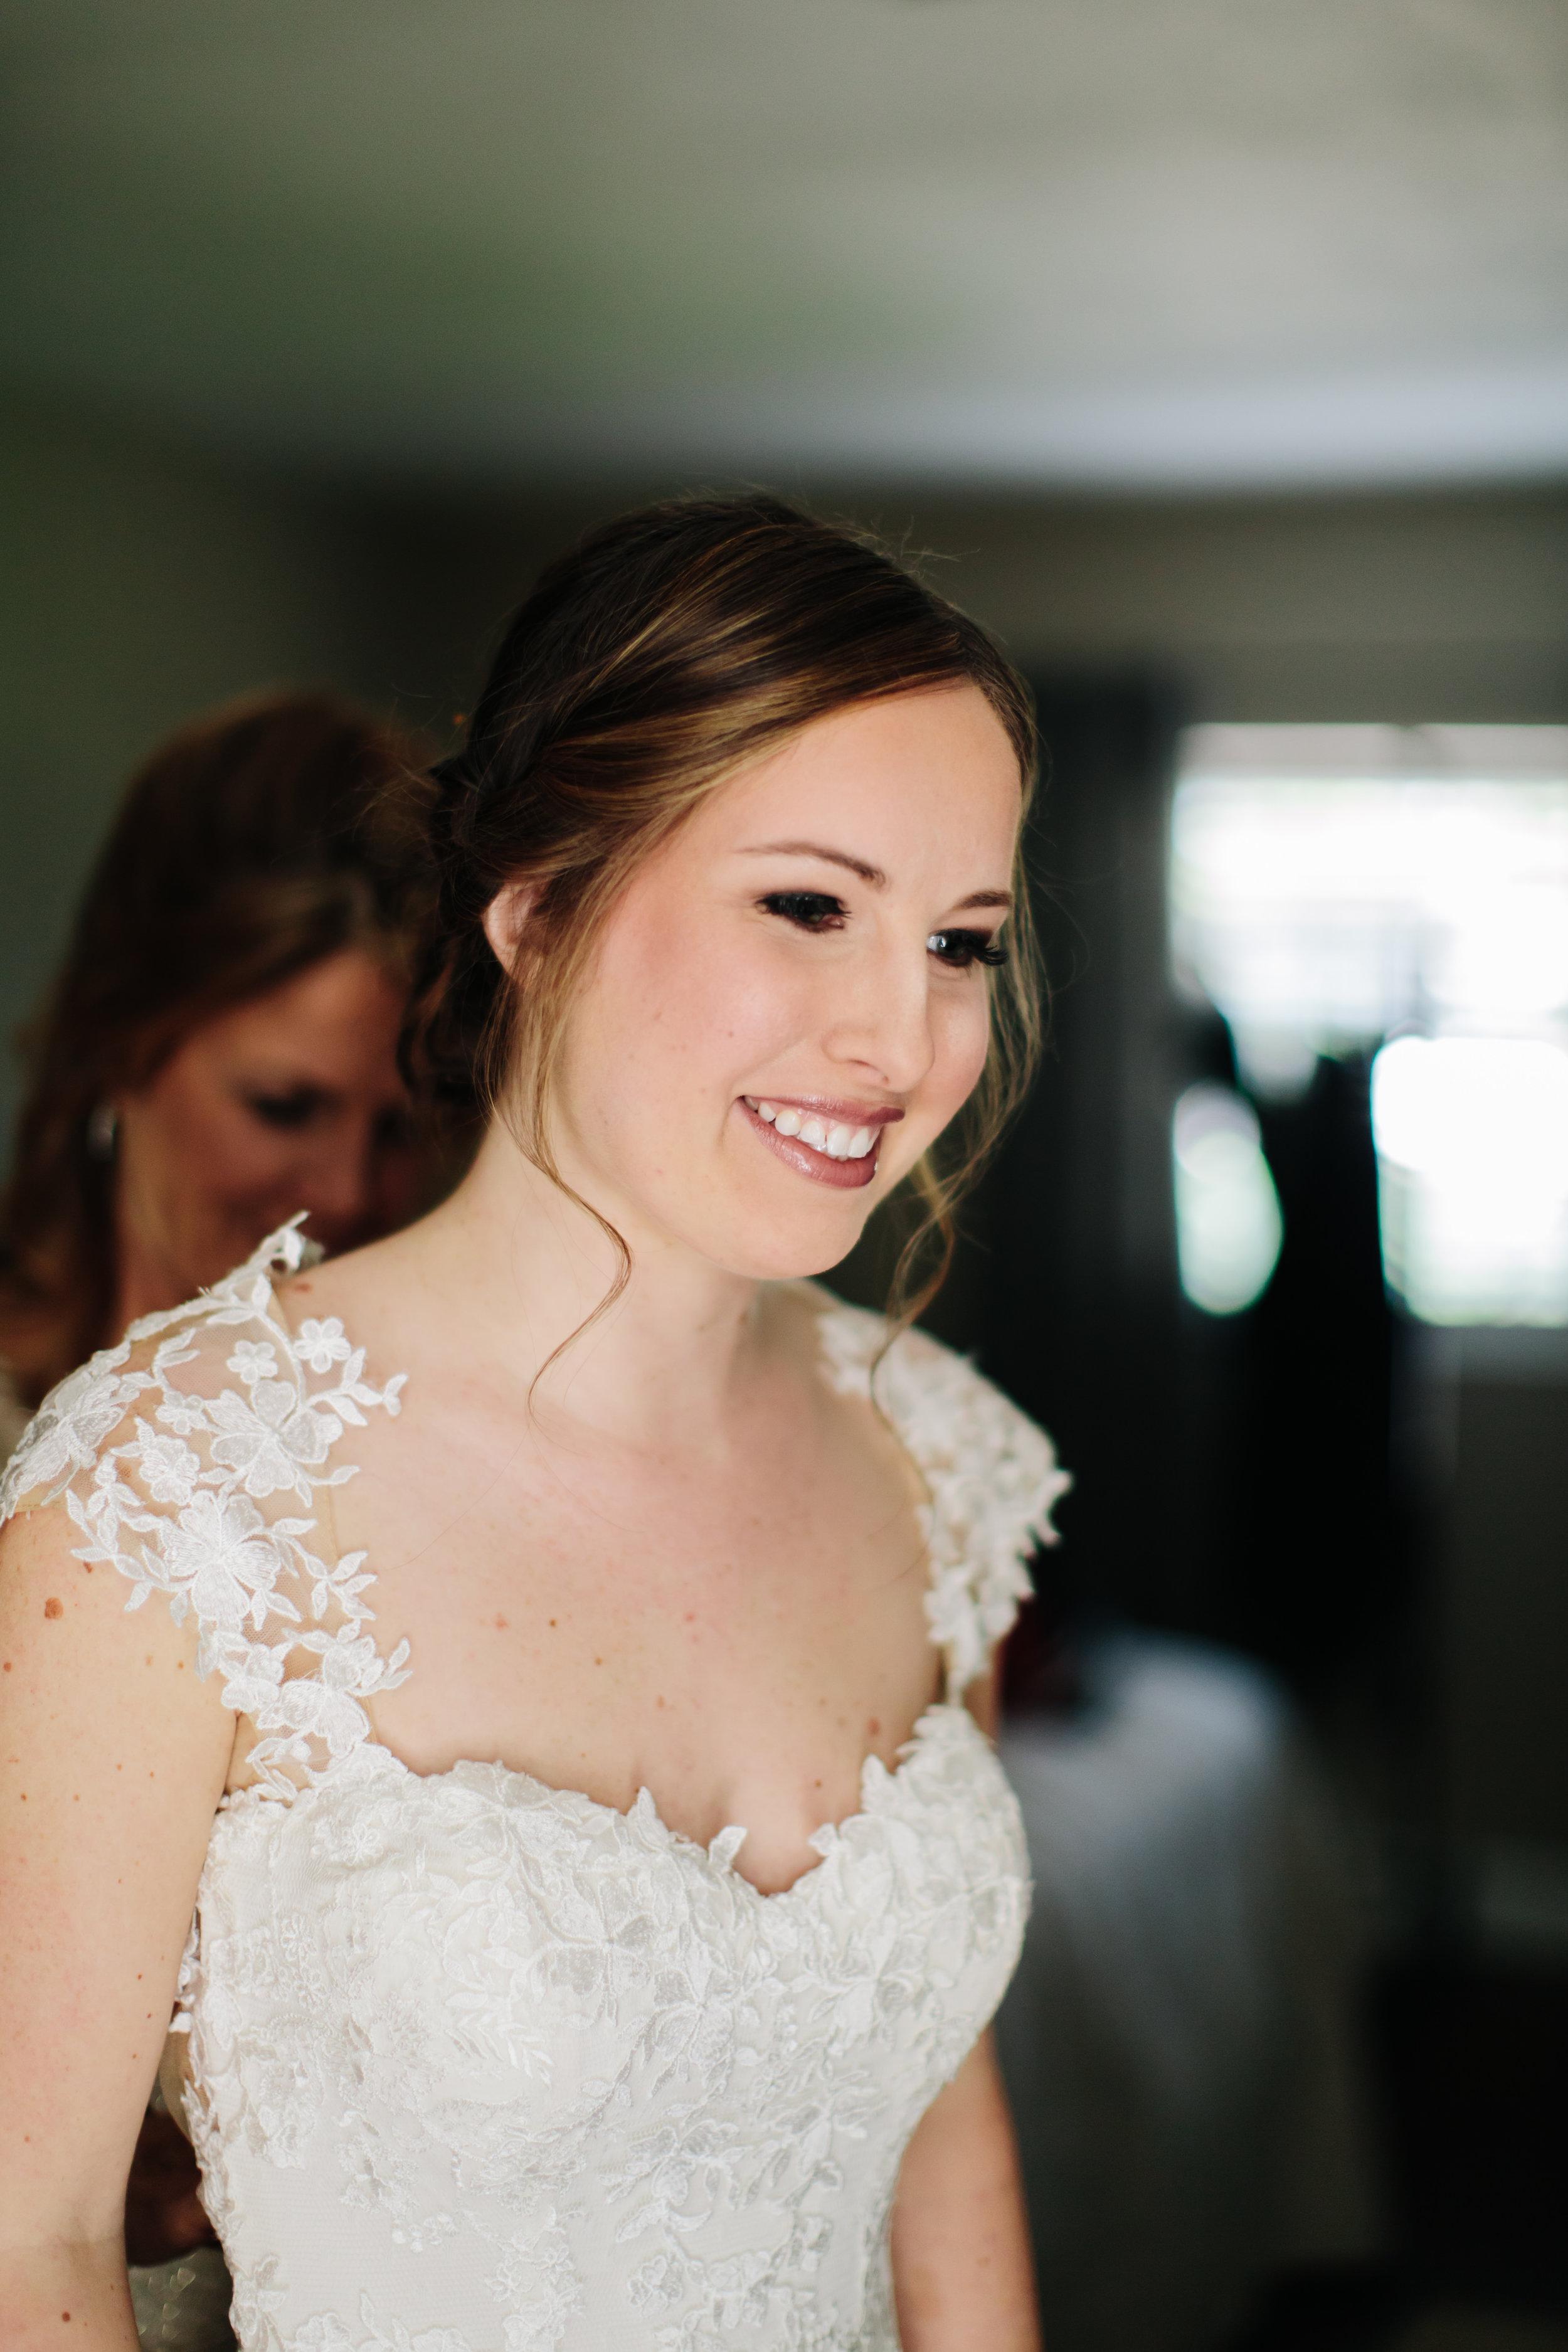 2018.02.17 Whitney and Joe Meyer Melbourne Wedding (37 of 890).jpg